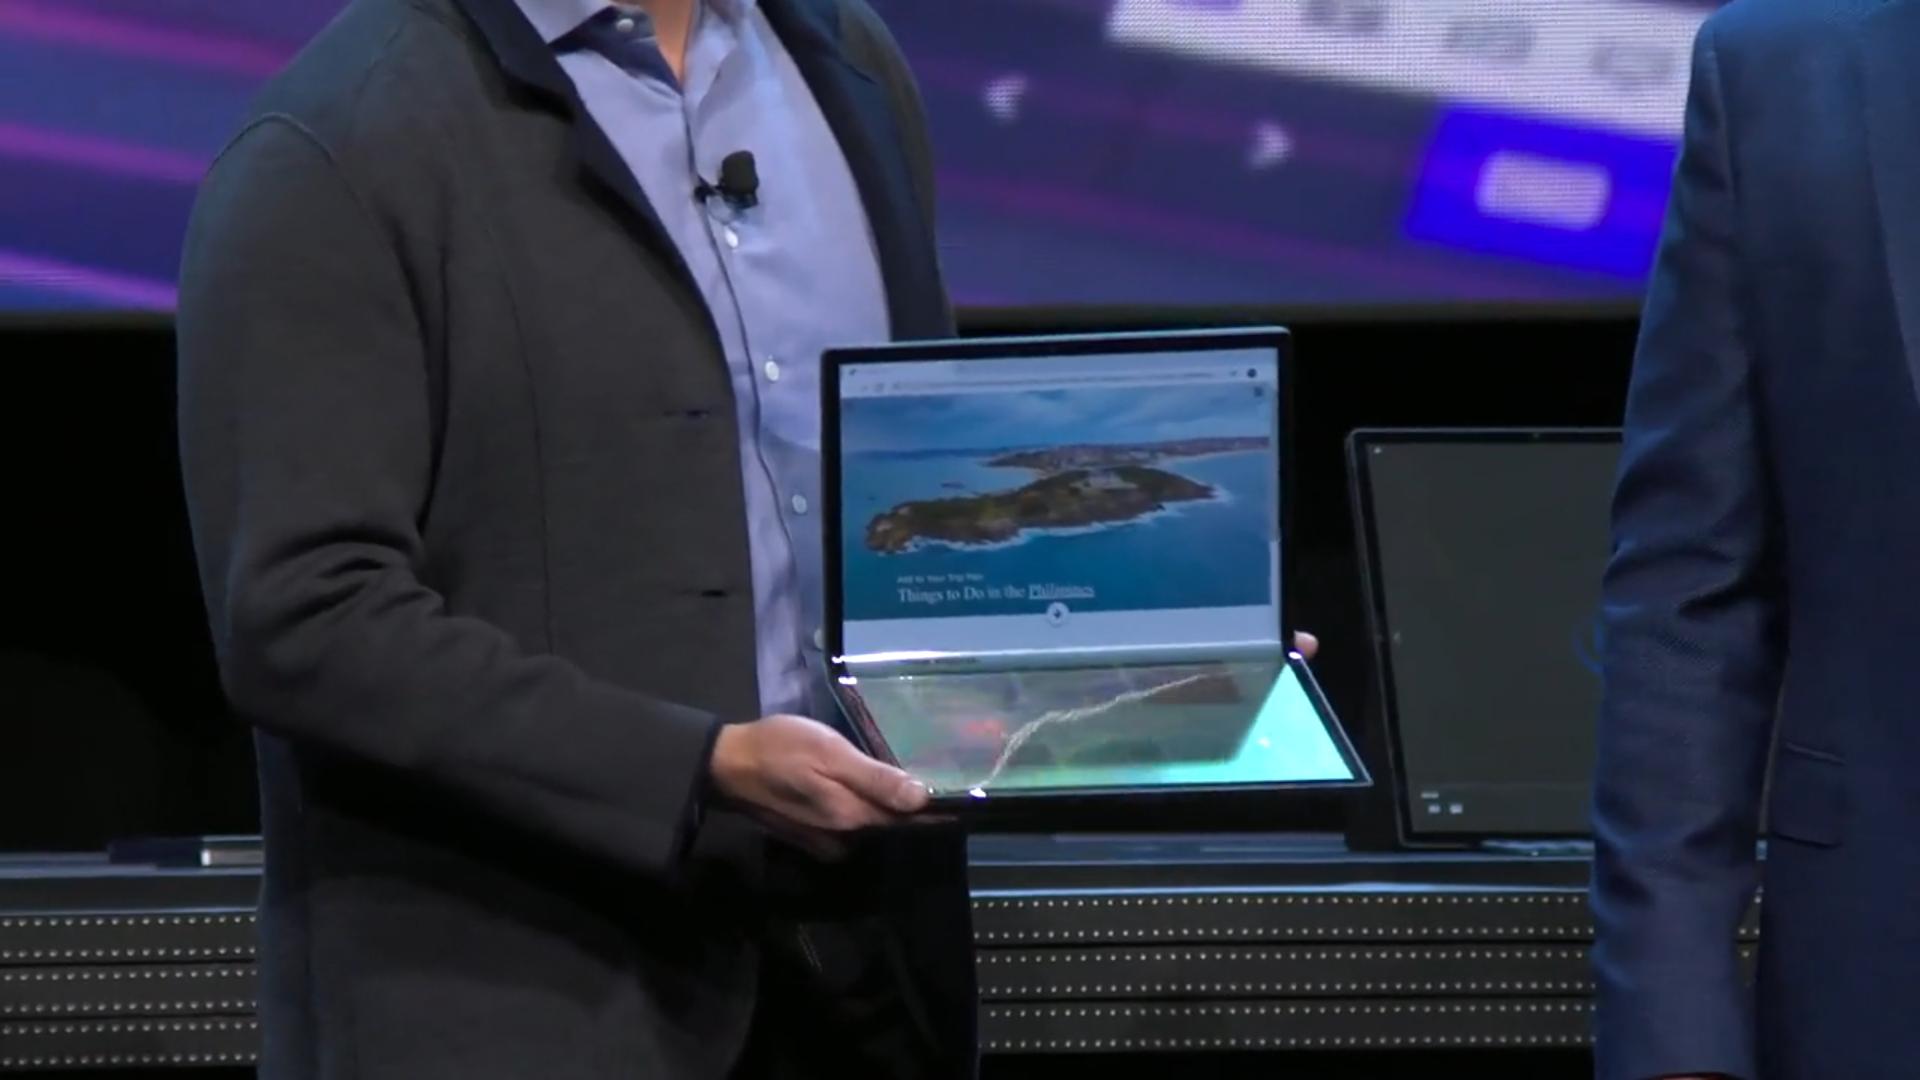 Intel Horseshoe Bend CES 2020